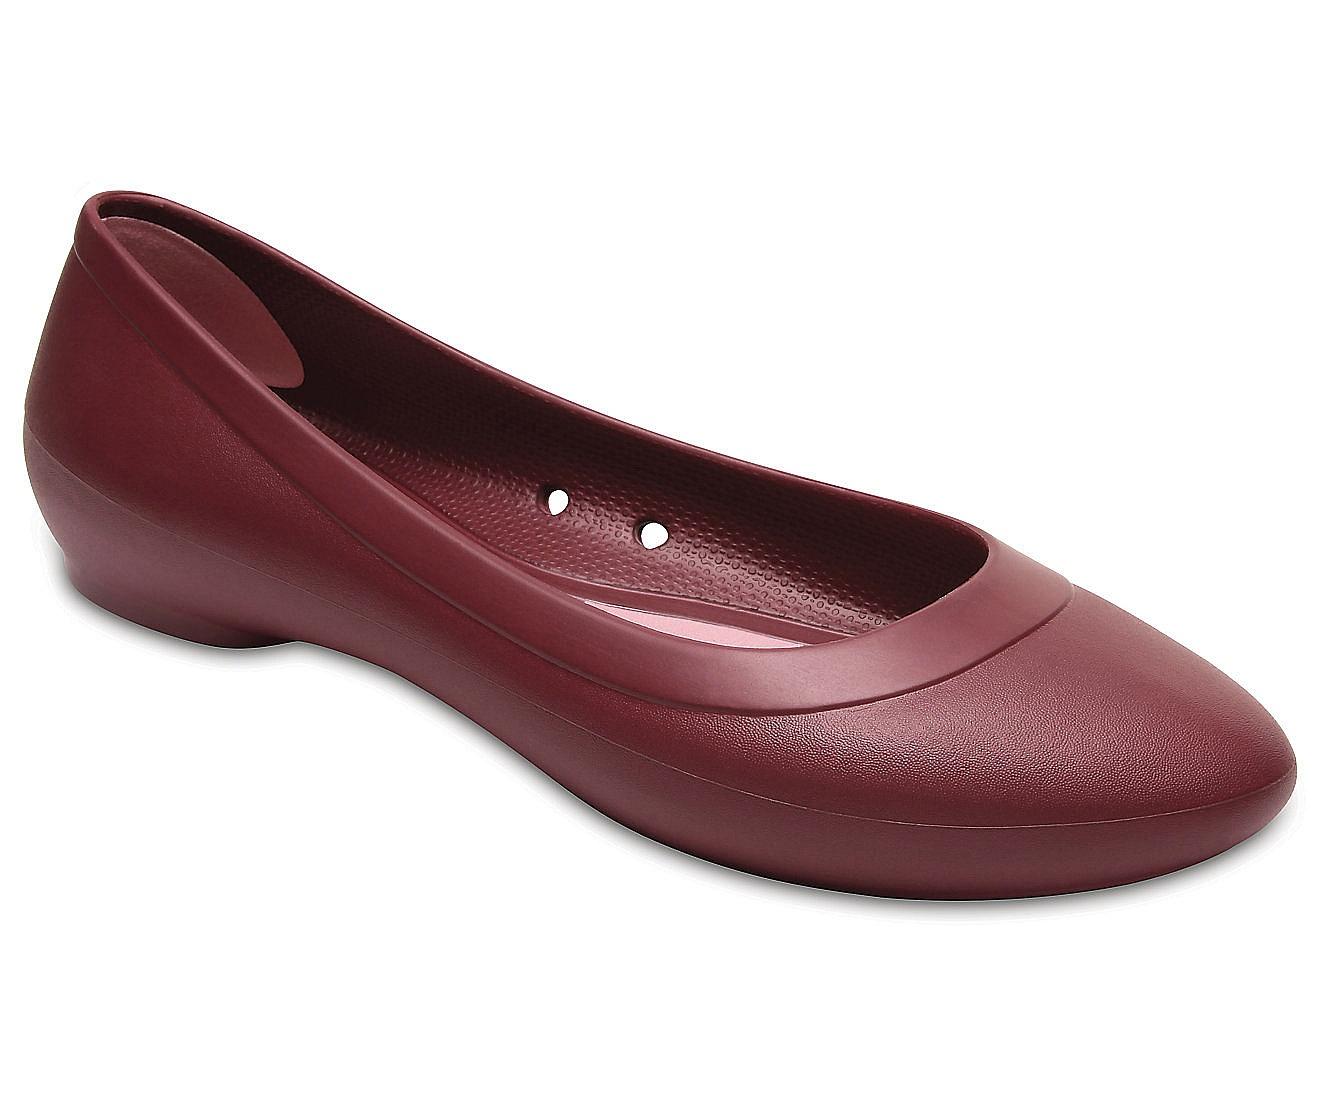 ec5598233408 boty Crocs Lina Flat - Garnet 36 37